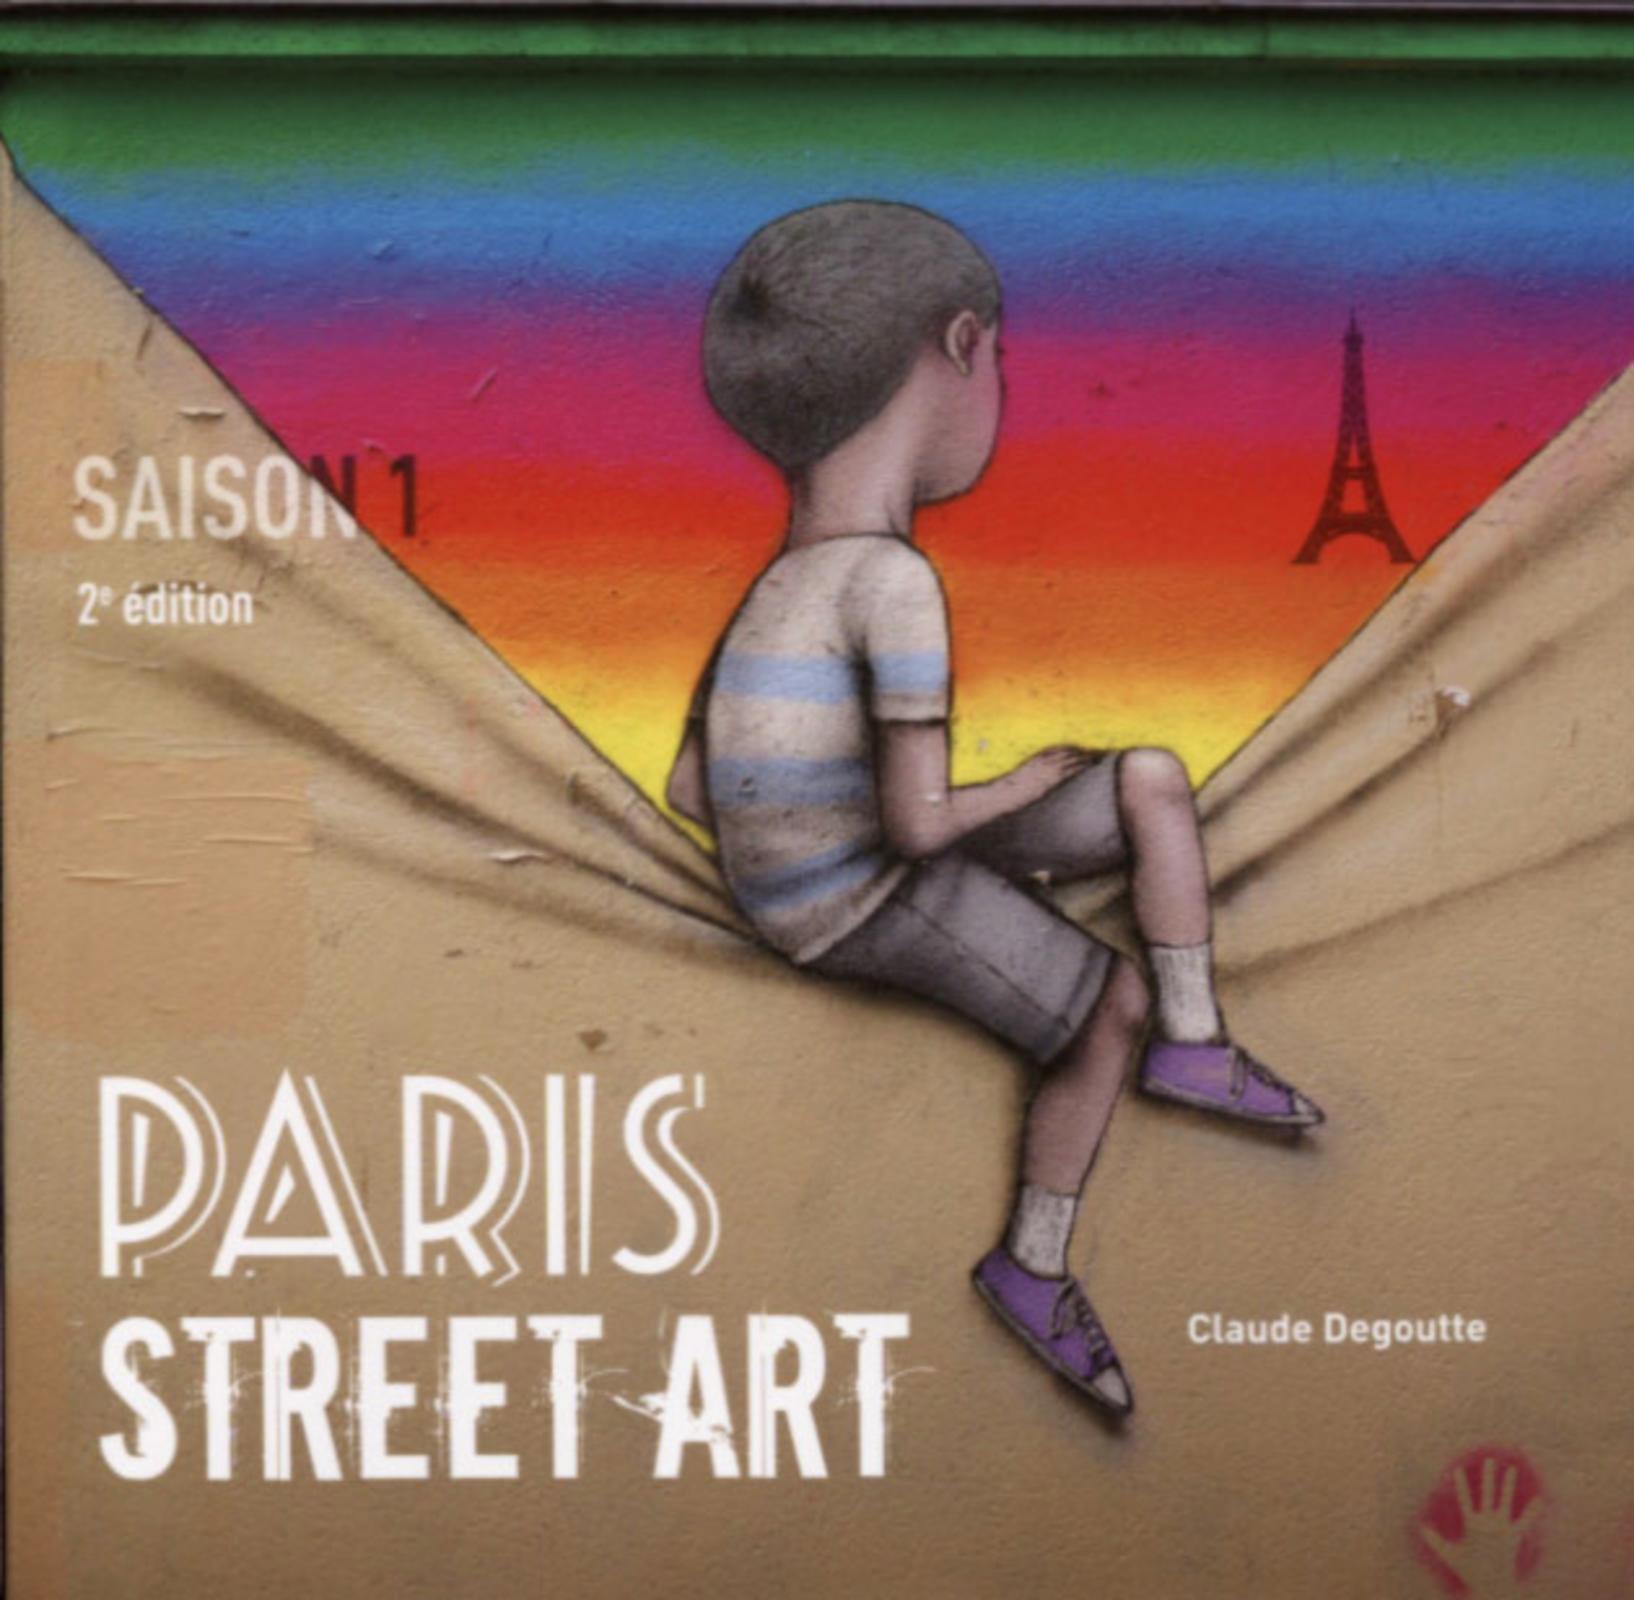 PARIS STREET ART SAISON 1